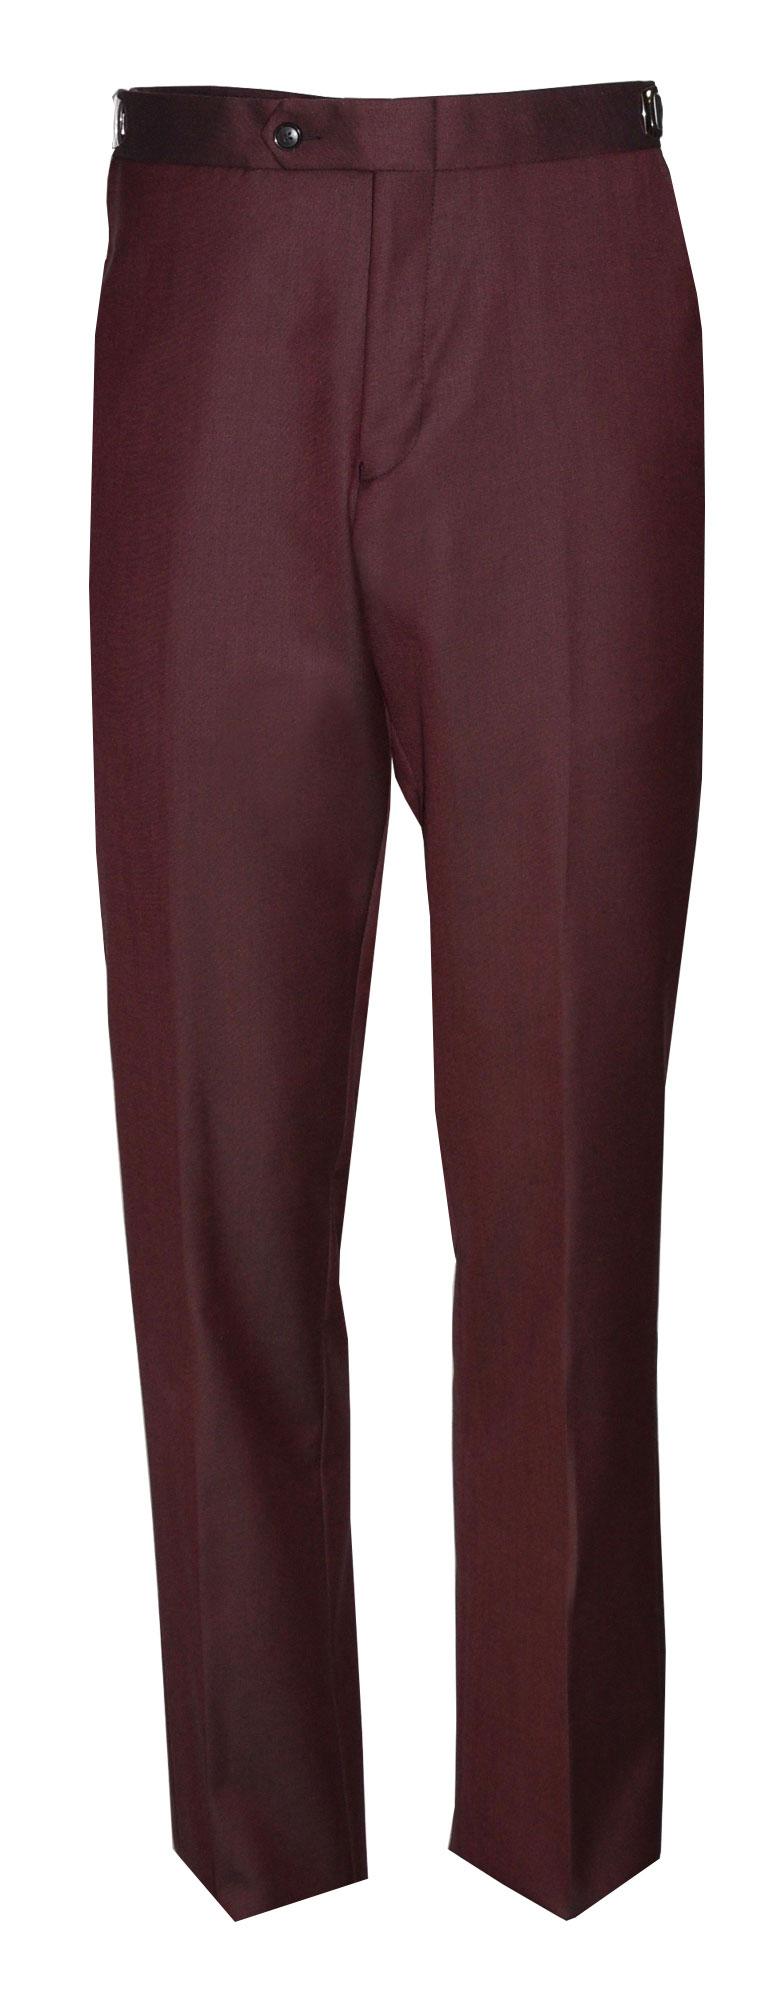 Tailored Fit Burgundy Tuxedo Pants